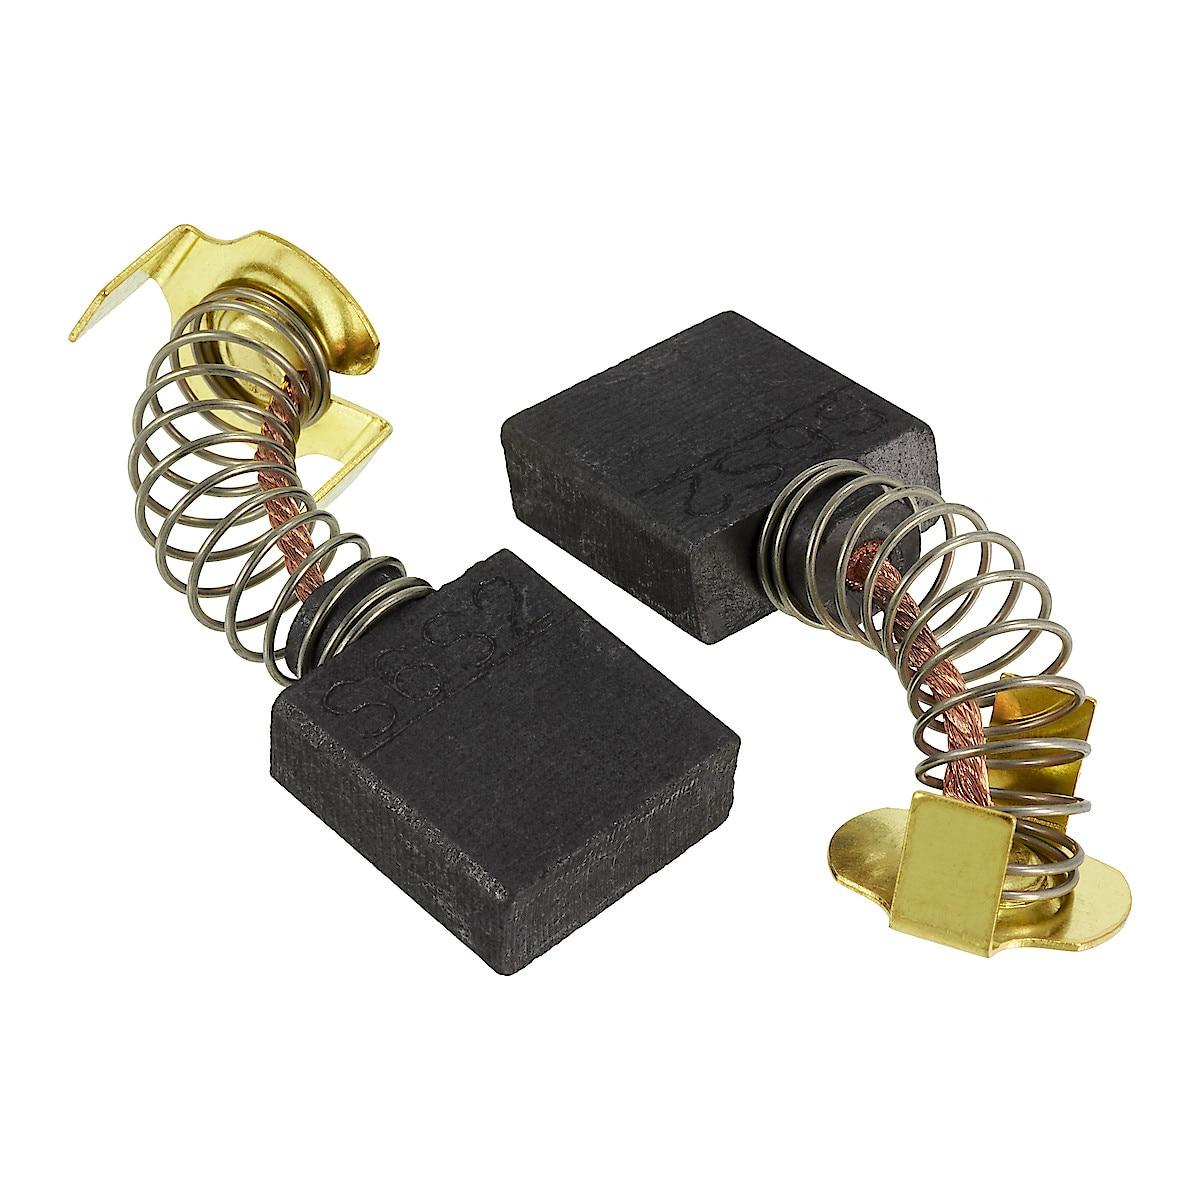 Kohlebürstensatz Bosch 17,8 x 17 x 6,9 mm